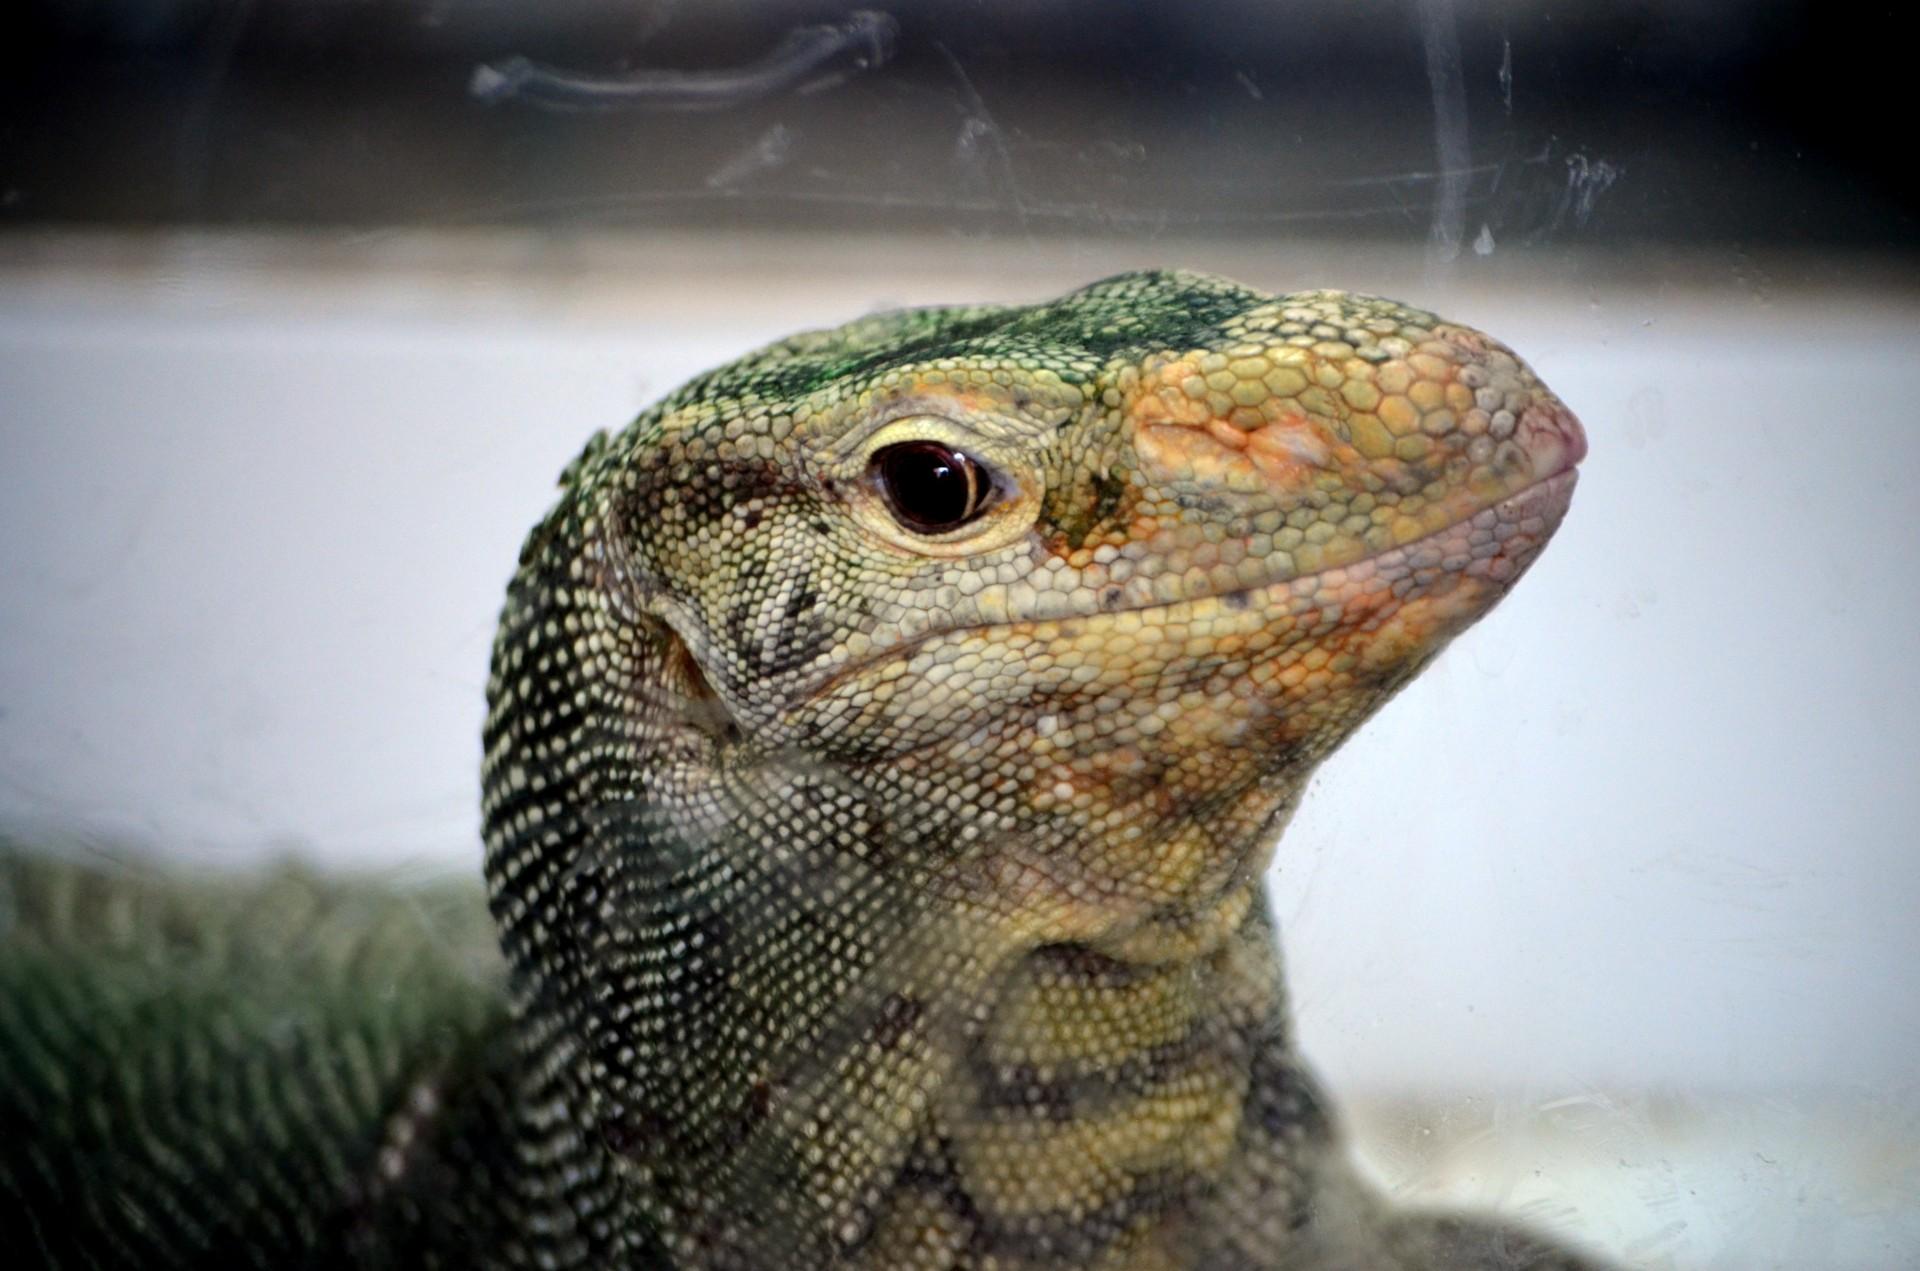 Lizard Head Free Stock Photo - Public Domain Pictures